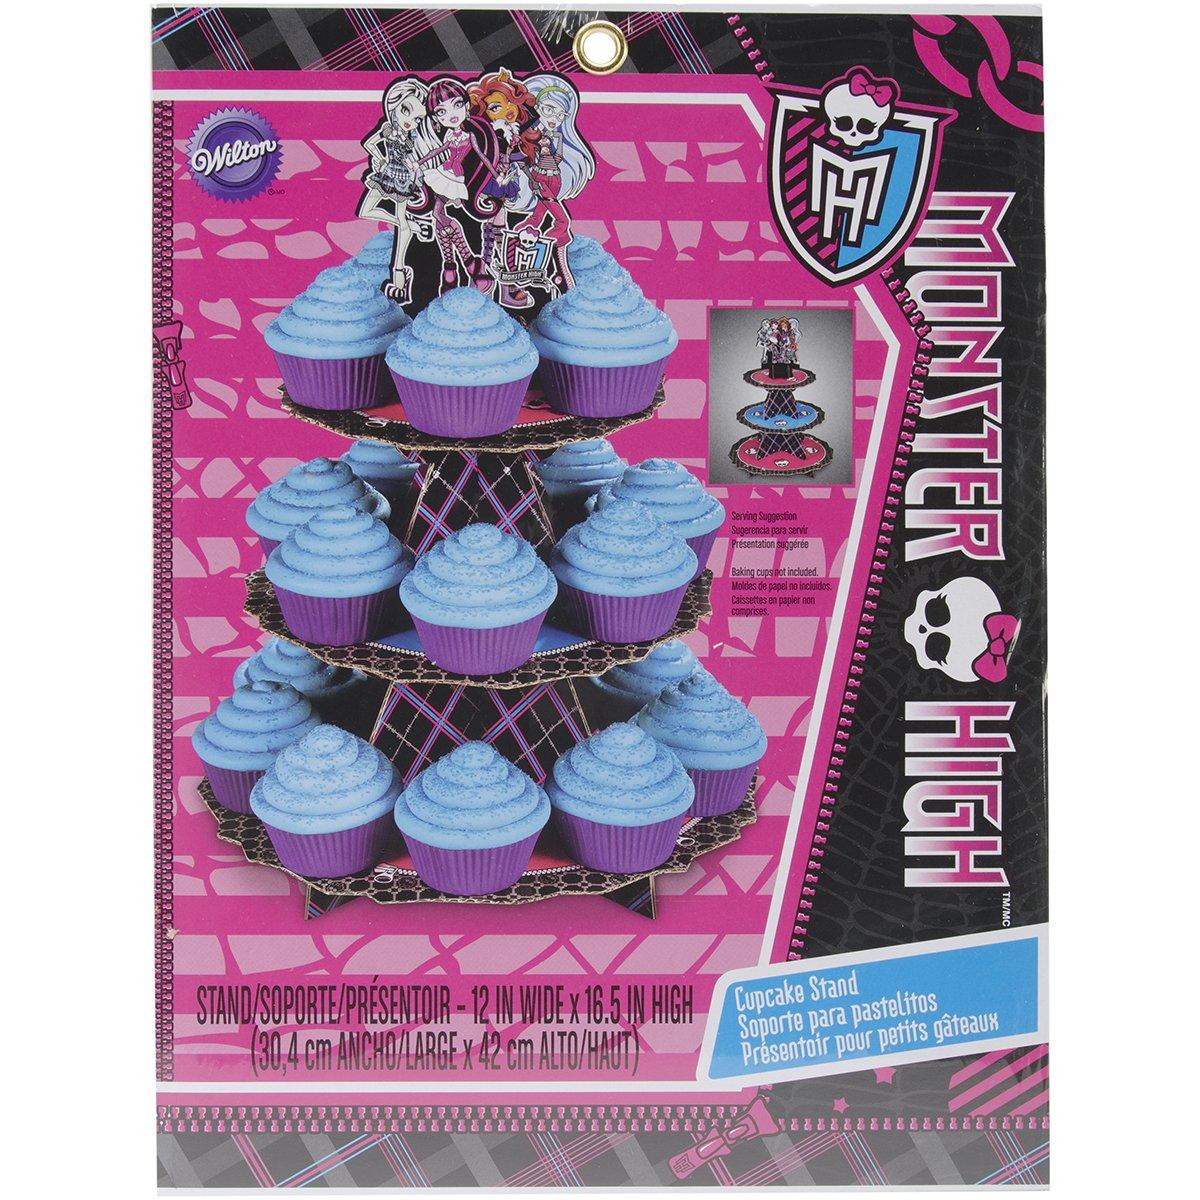 Wilton 1512-6677 Monster High Cupcake Stand